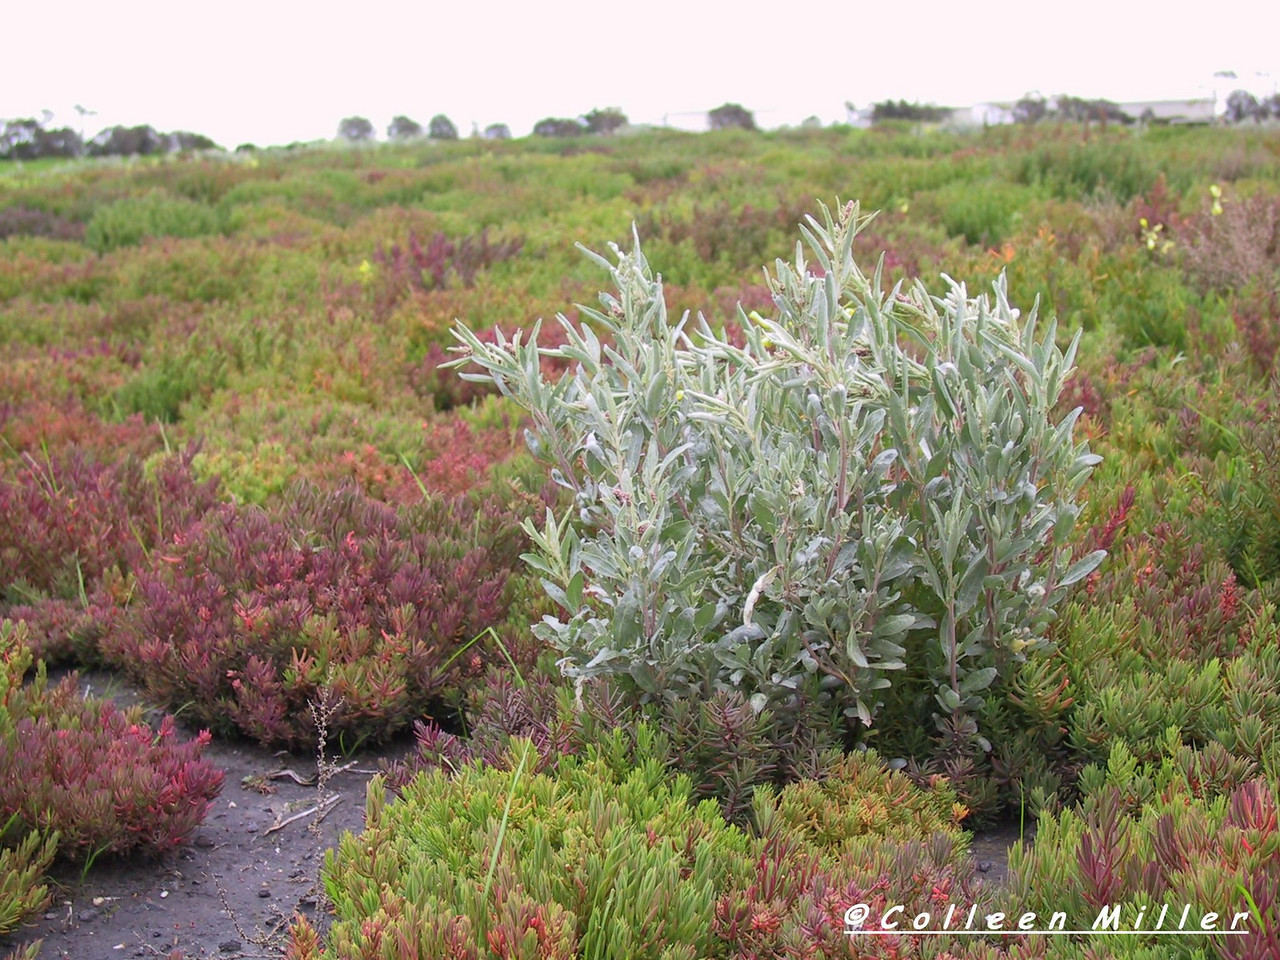 Atriplex cinerea / Coast Saltbush  Shrub (2m x 3m), flowering Sep to Mar.   Plants are dioecious, male flowers reddish purple in globular clusters, female flowers cream in axillary clusters